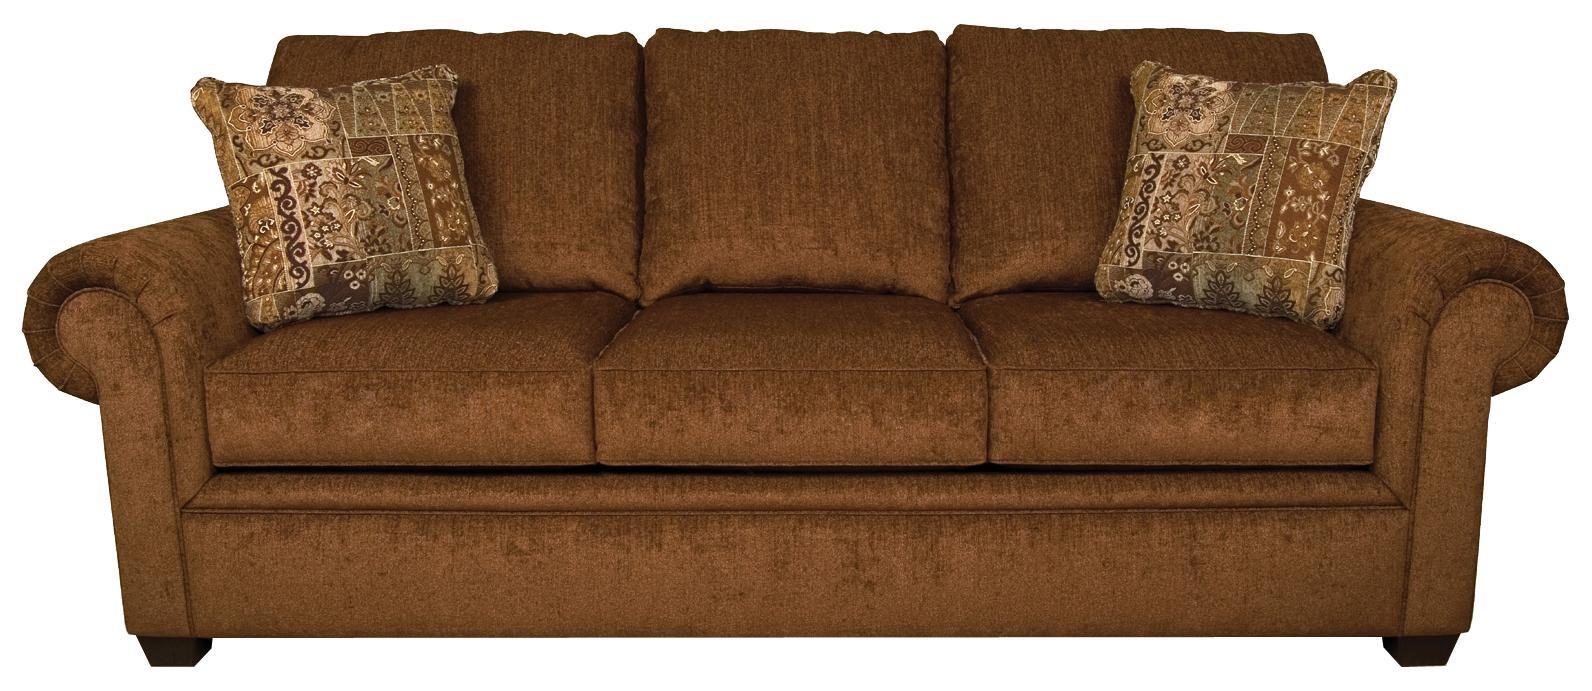 england brett rolled arm sofa with exposed block legs sheely s rh sheelys com